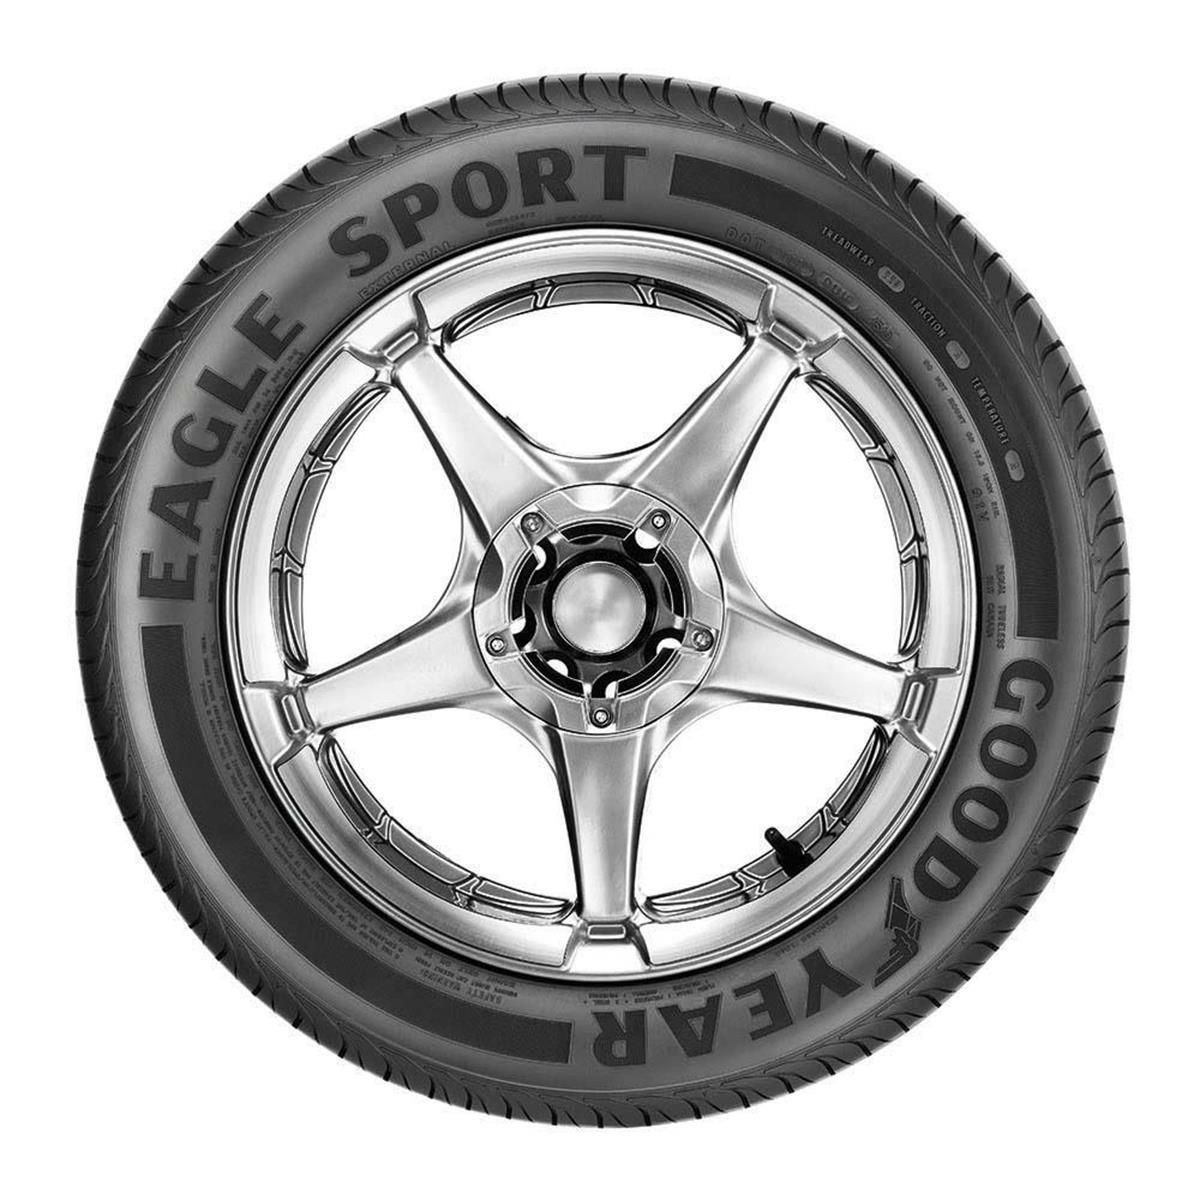 Pneu 185/60 R 15 - Eagle Sport 88h - Goodyear